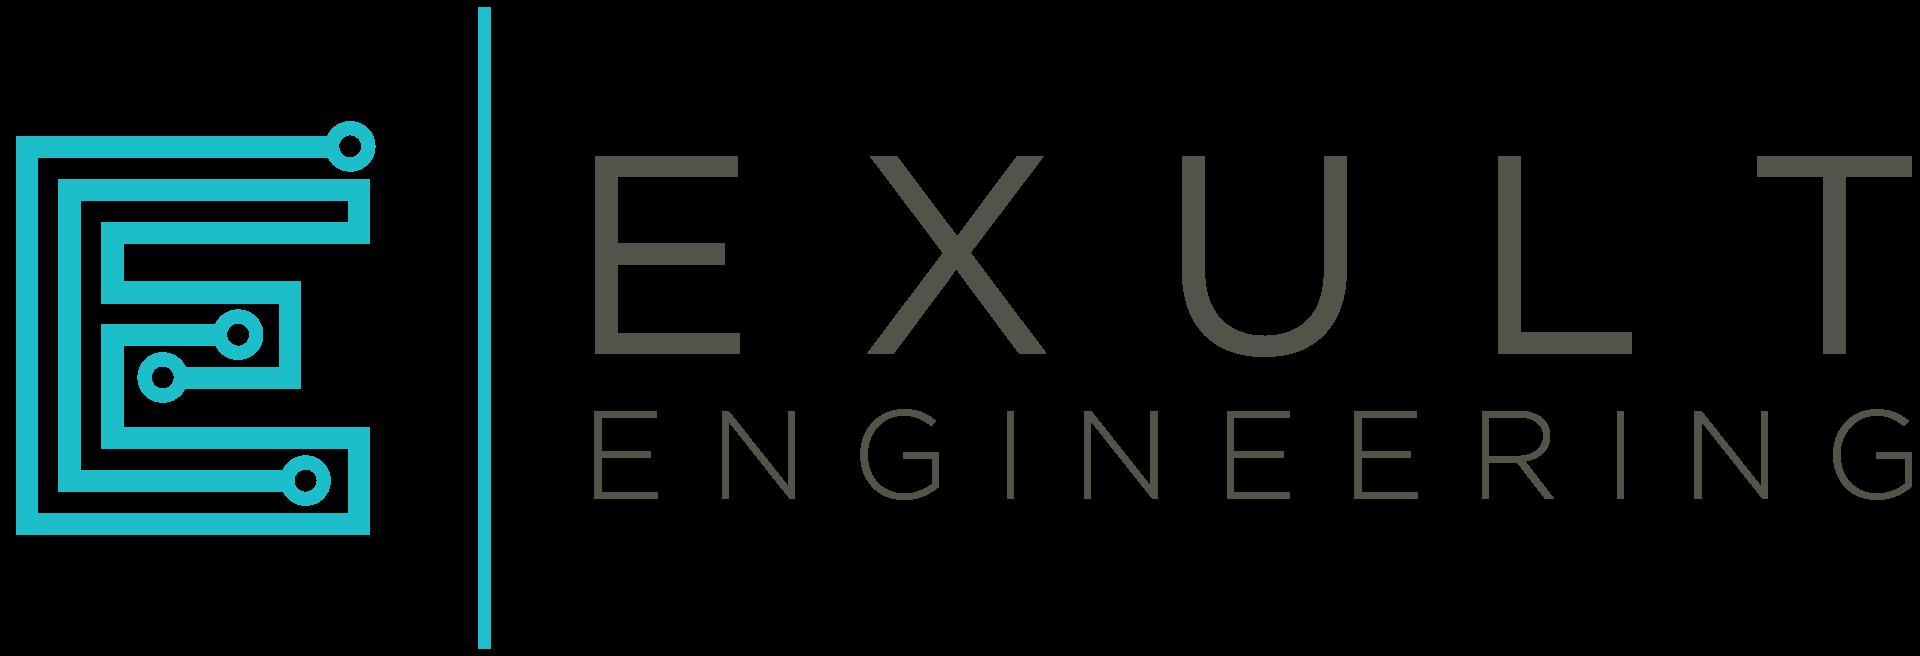 Exult-Engineering-Horizontal-Logo